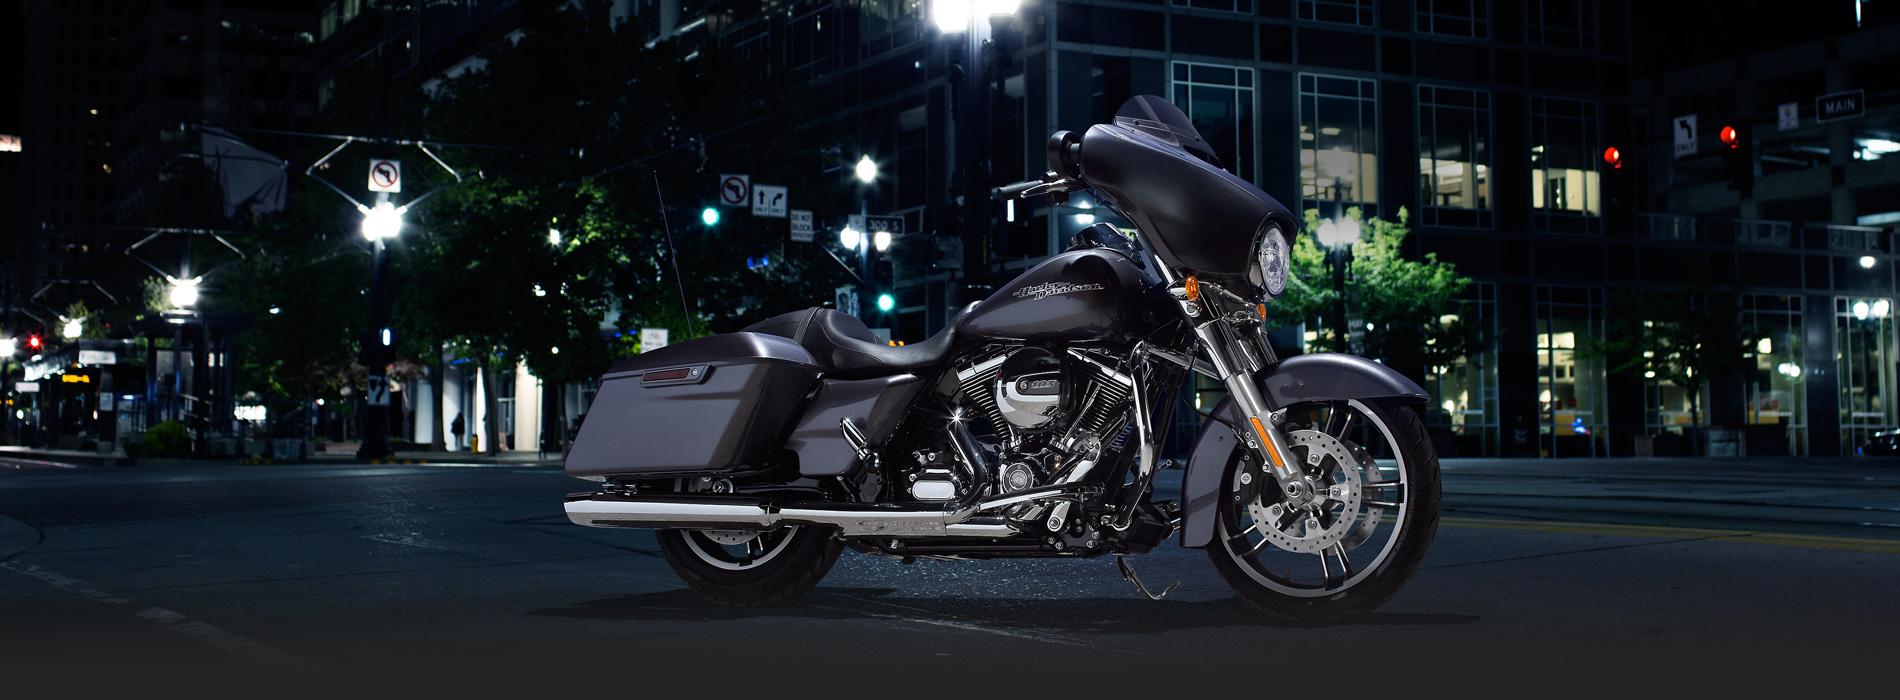 Harley-Davidson Street Glide Wallpapers, Vehicles, HQ